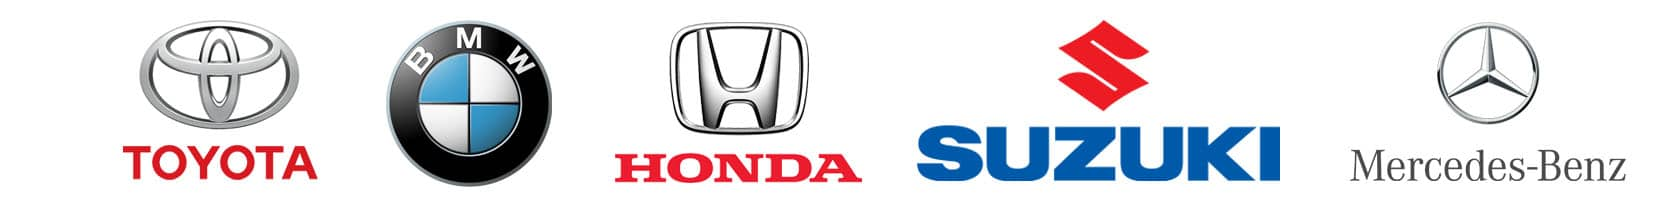 yourcar-brands (4)